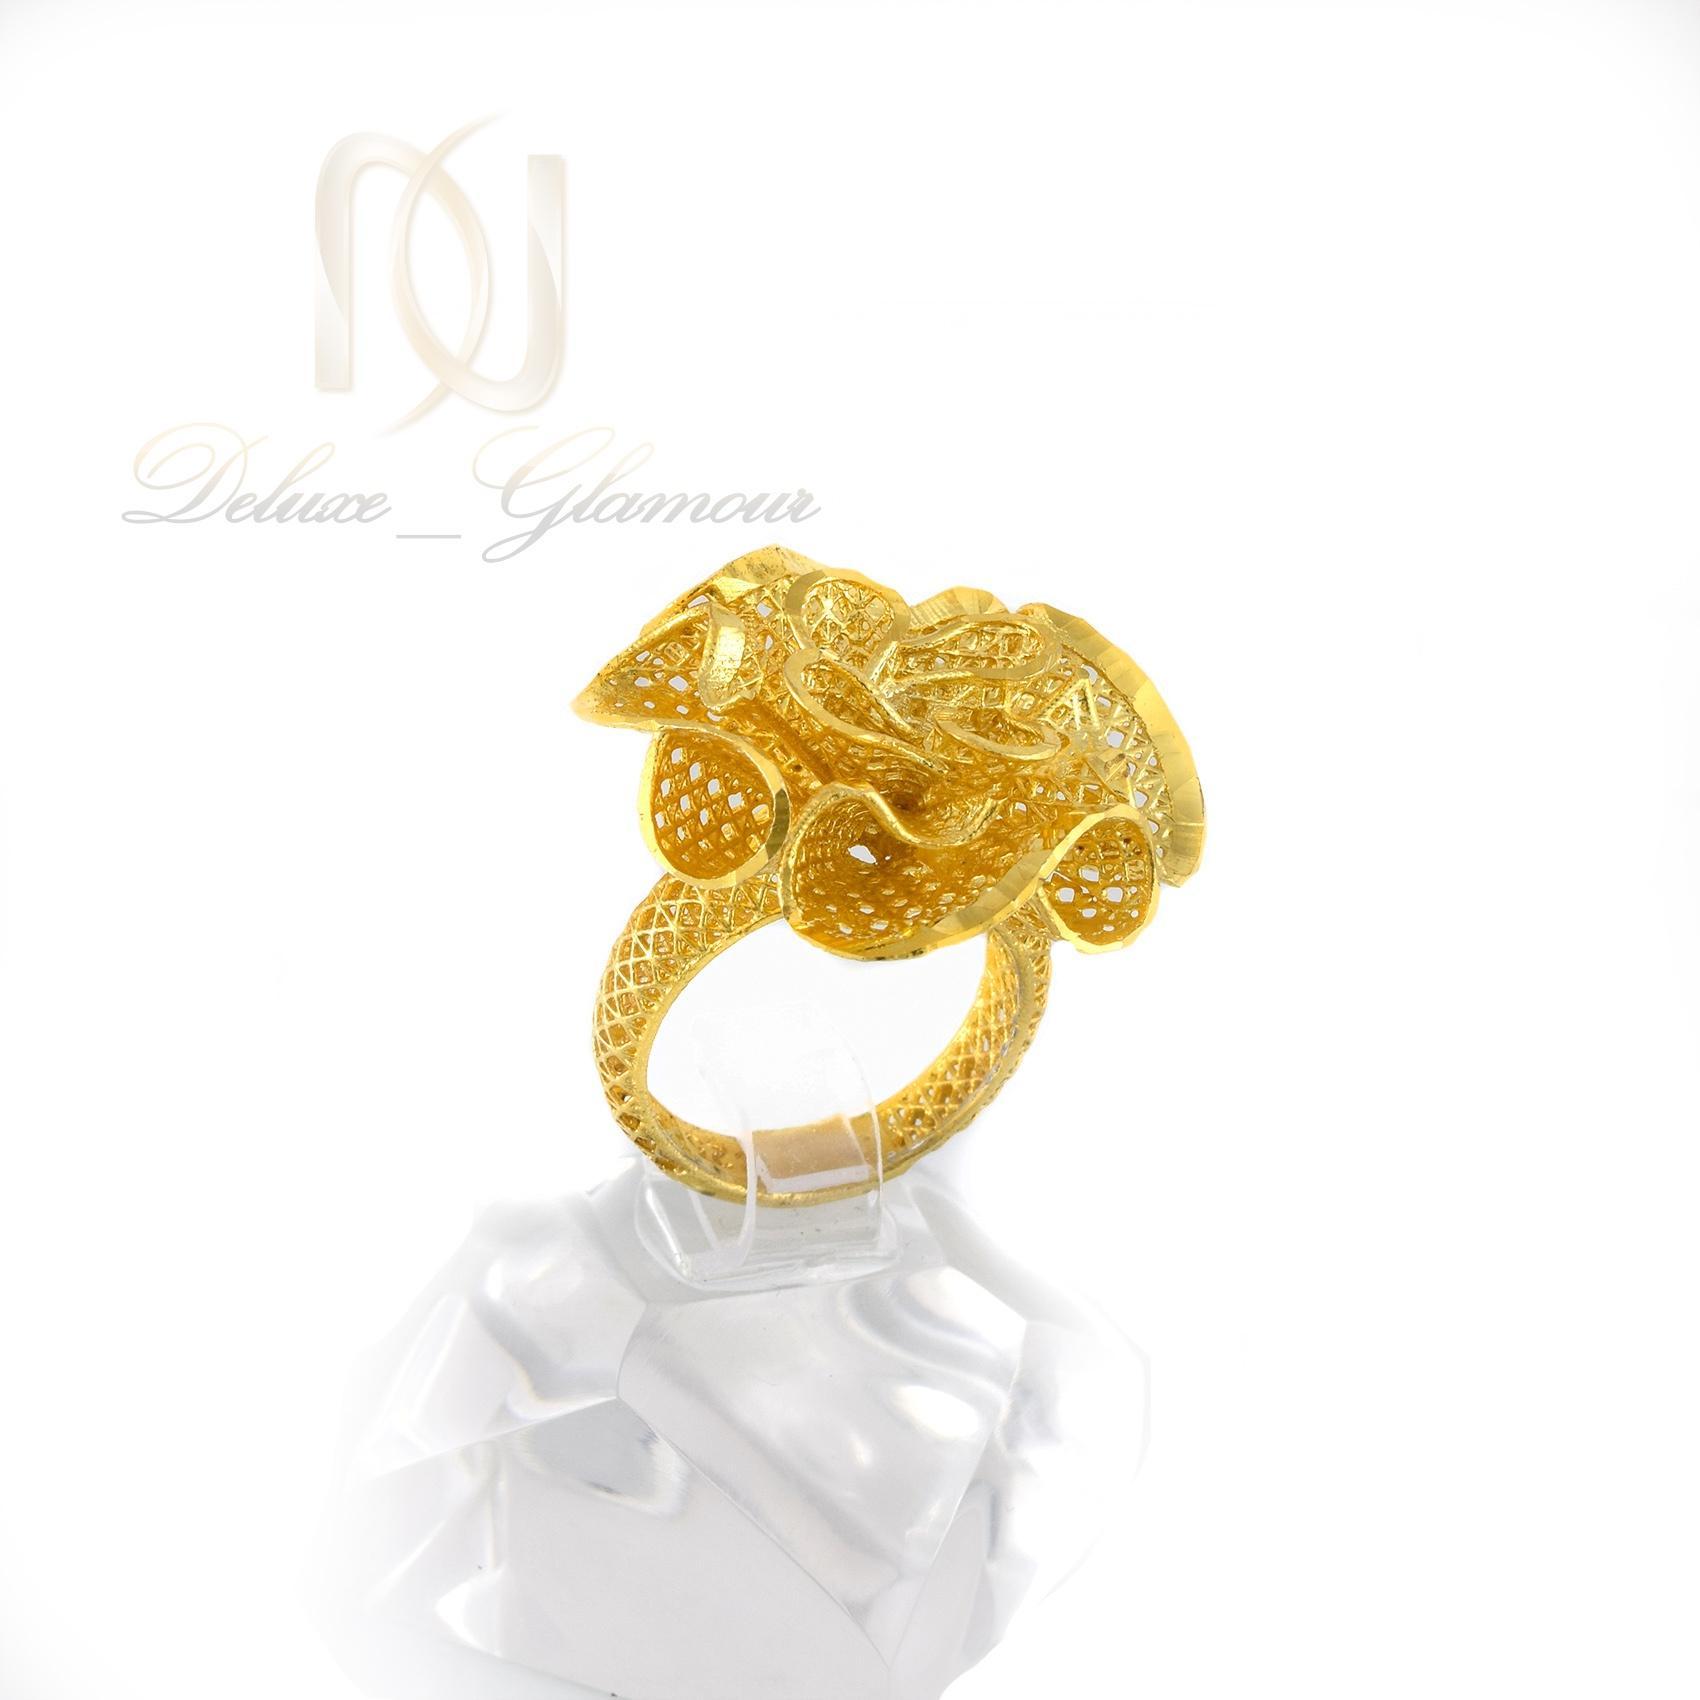 انگشتر نقره زنانه طرح طلاي گل RG-N327 از نماي روبرو